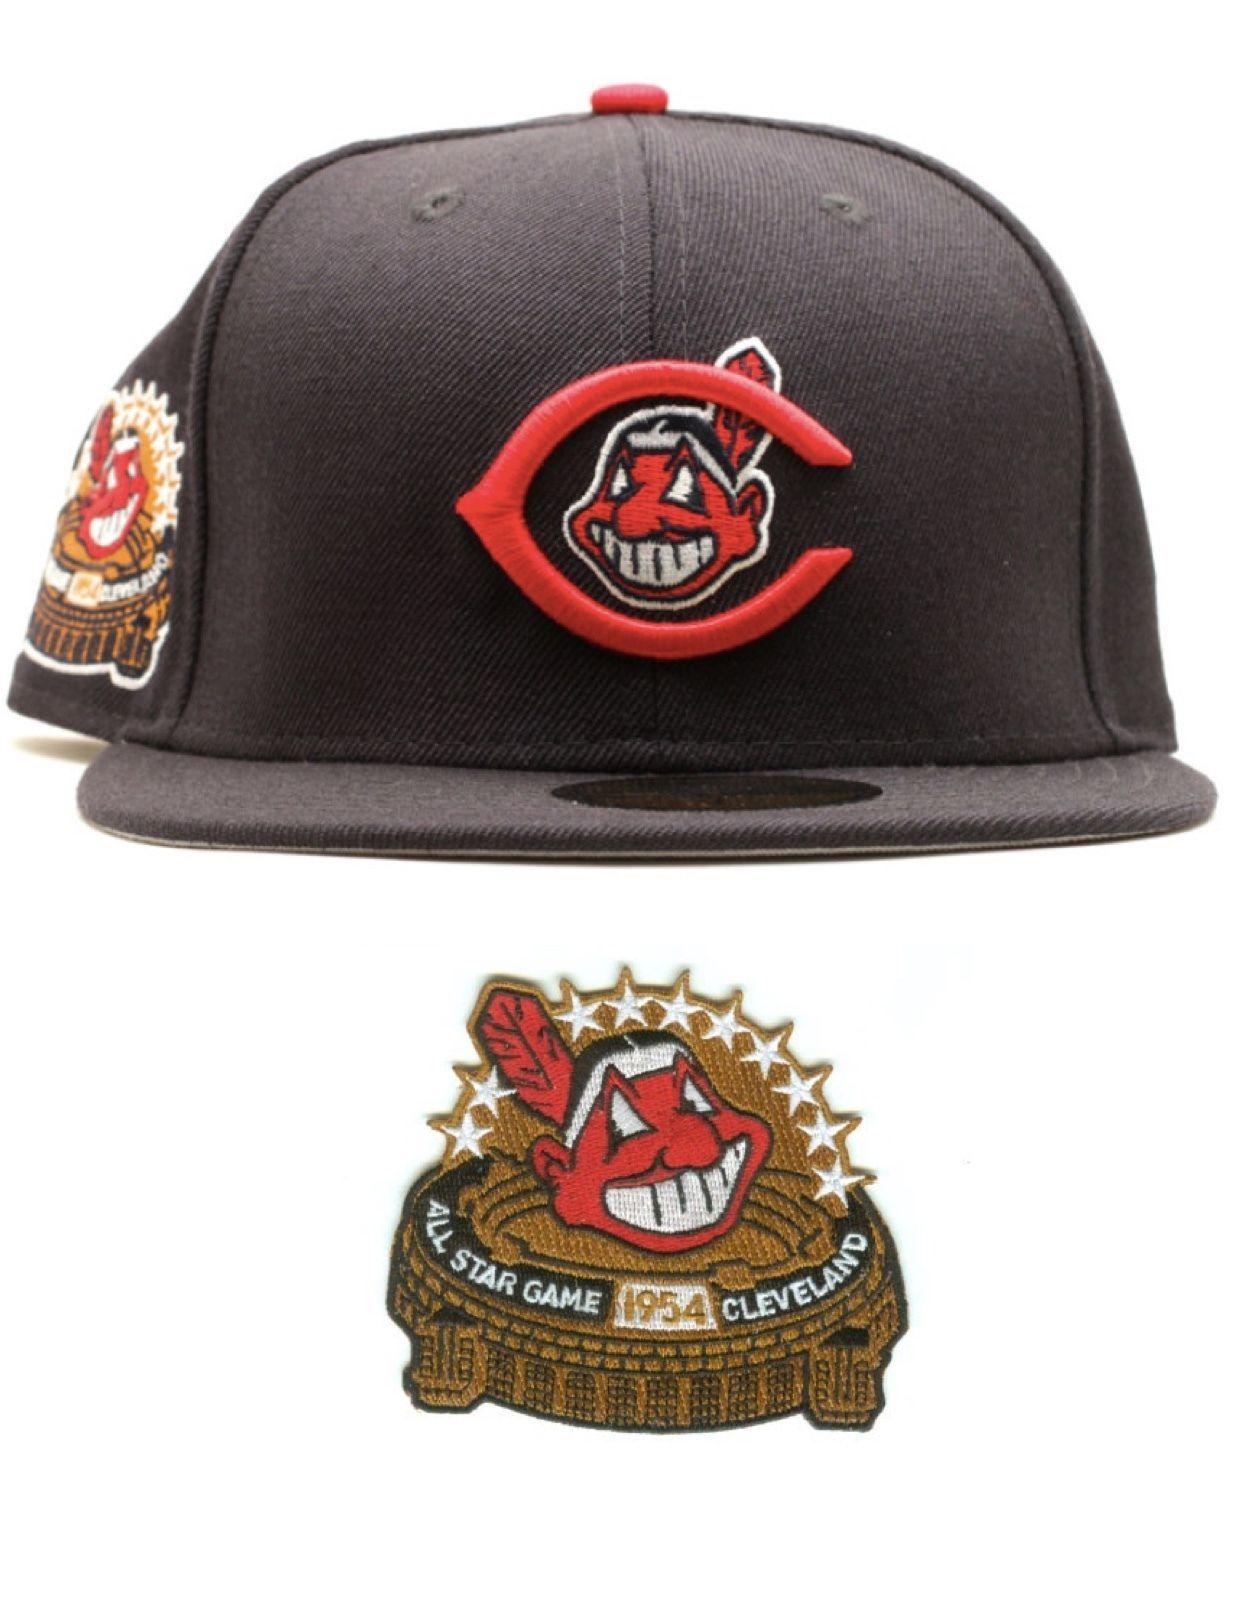 Cleveland Indians 1954 Allstar Game Era 59fifty Fitted Baseball Cap Fitted Baseball Caps New Era Hats Fitted Hats